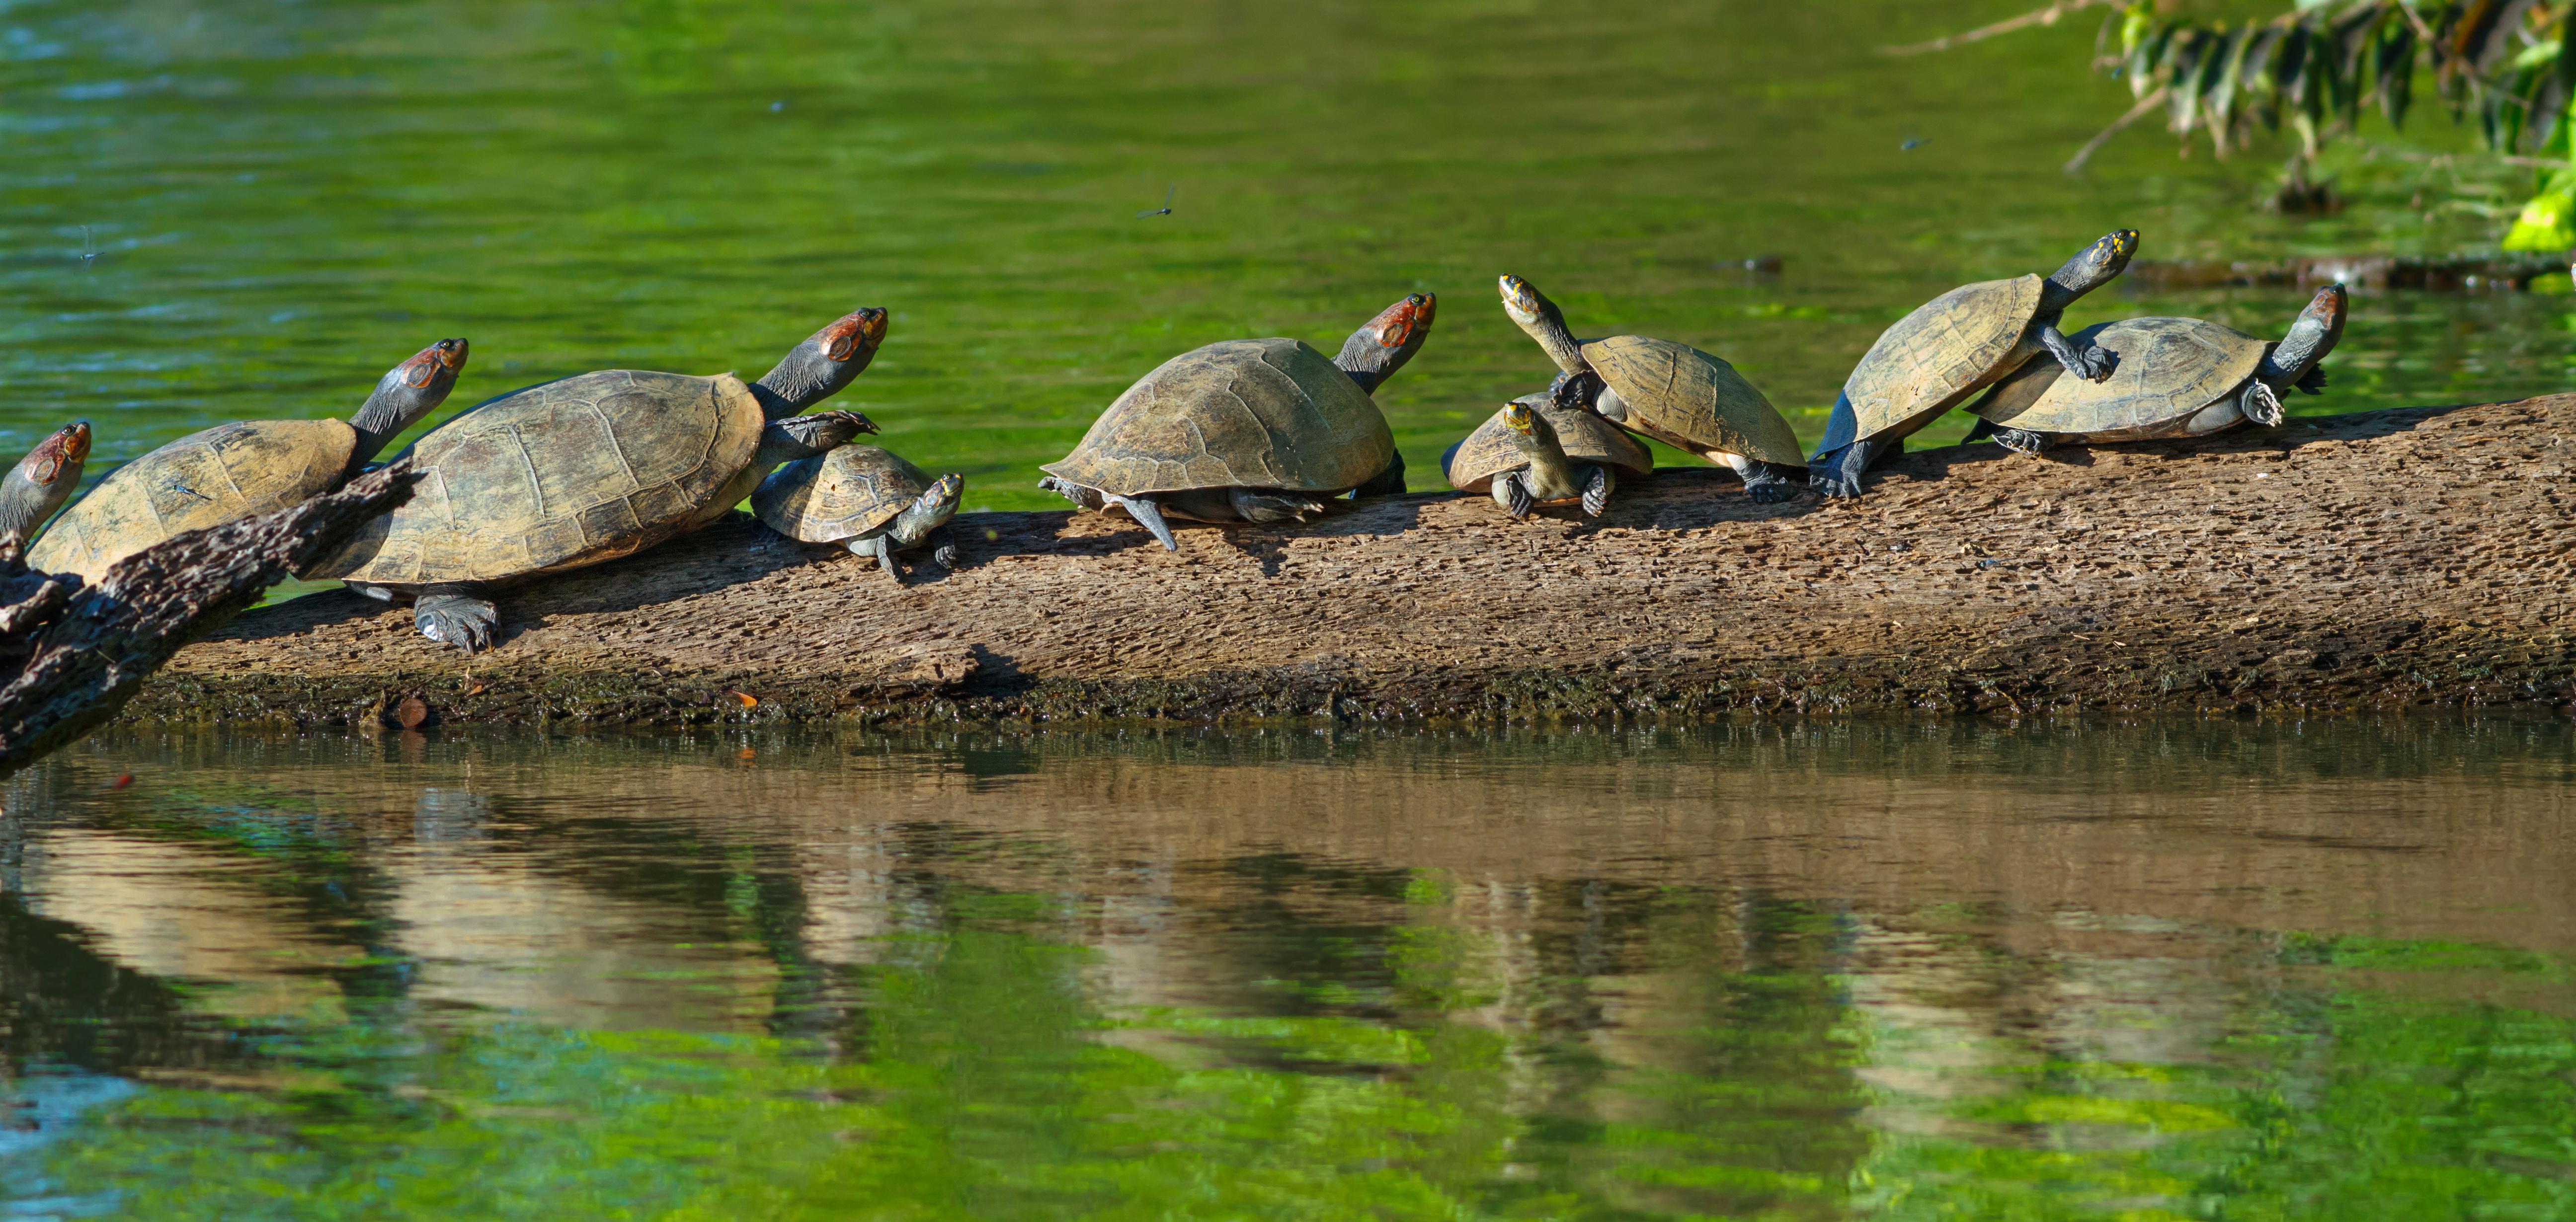 River turtles in the Amazon Tambopata national park, peru